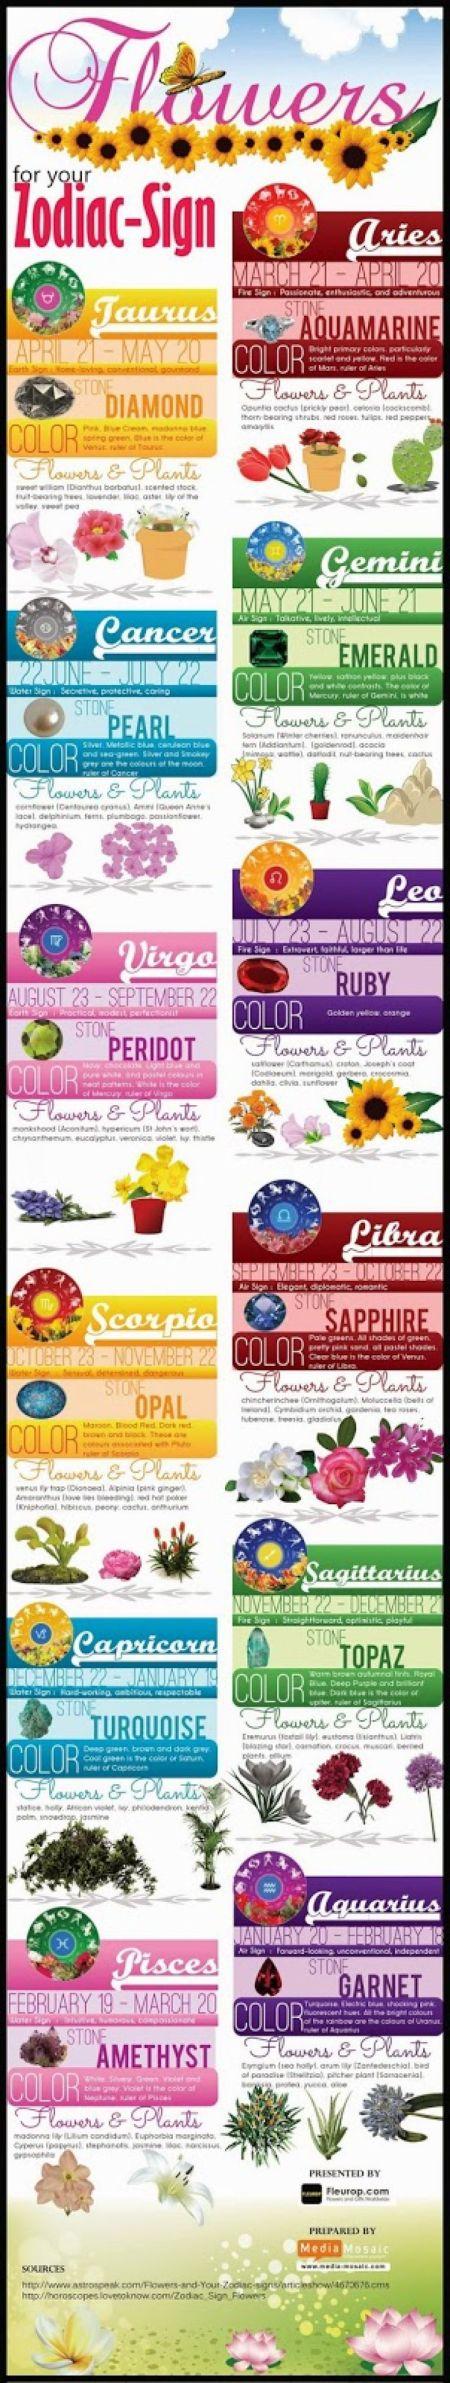 Zodiac Signs Corresponding Body Parts